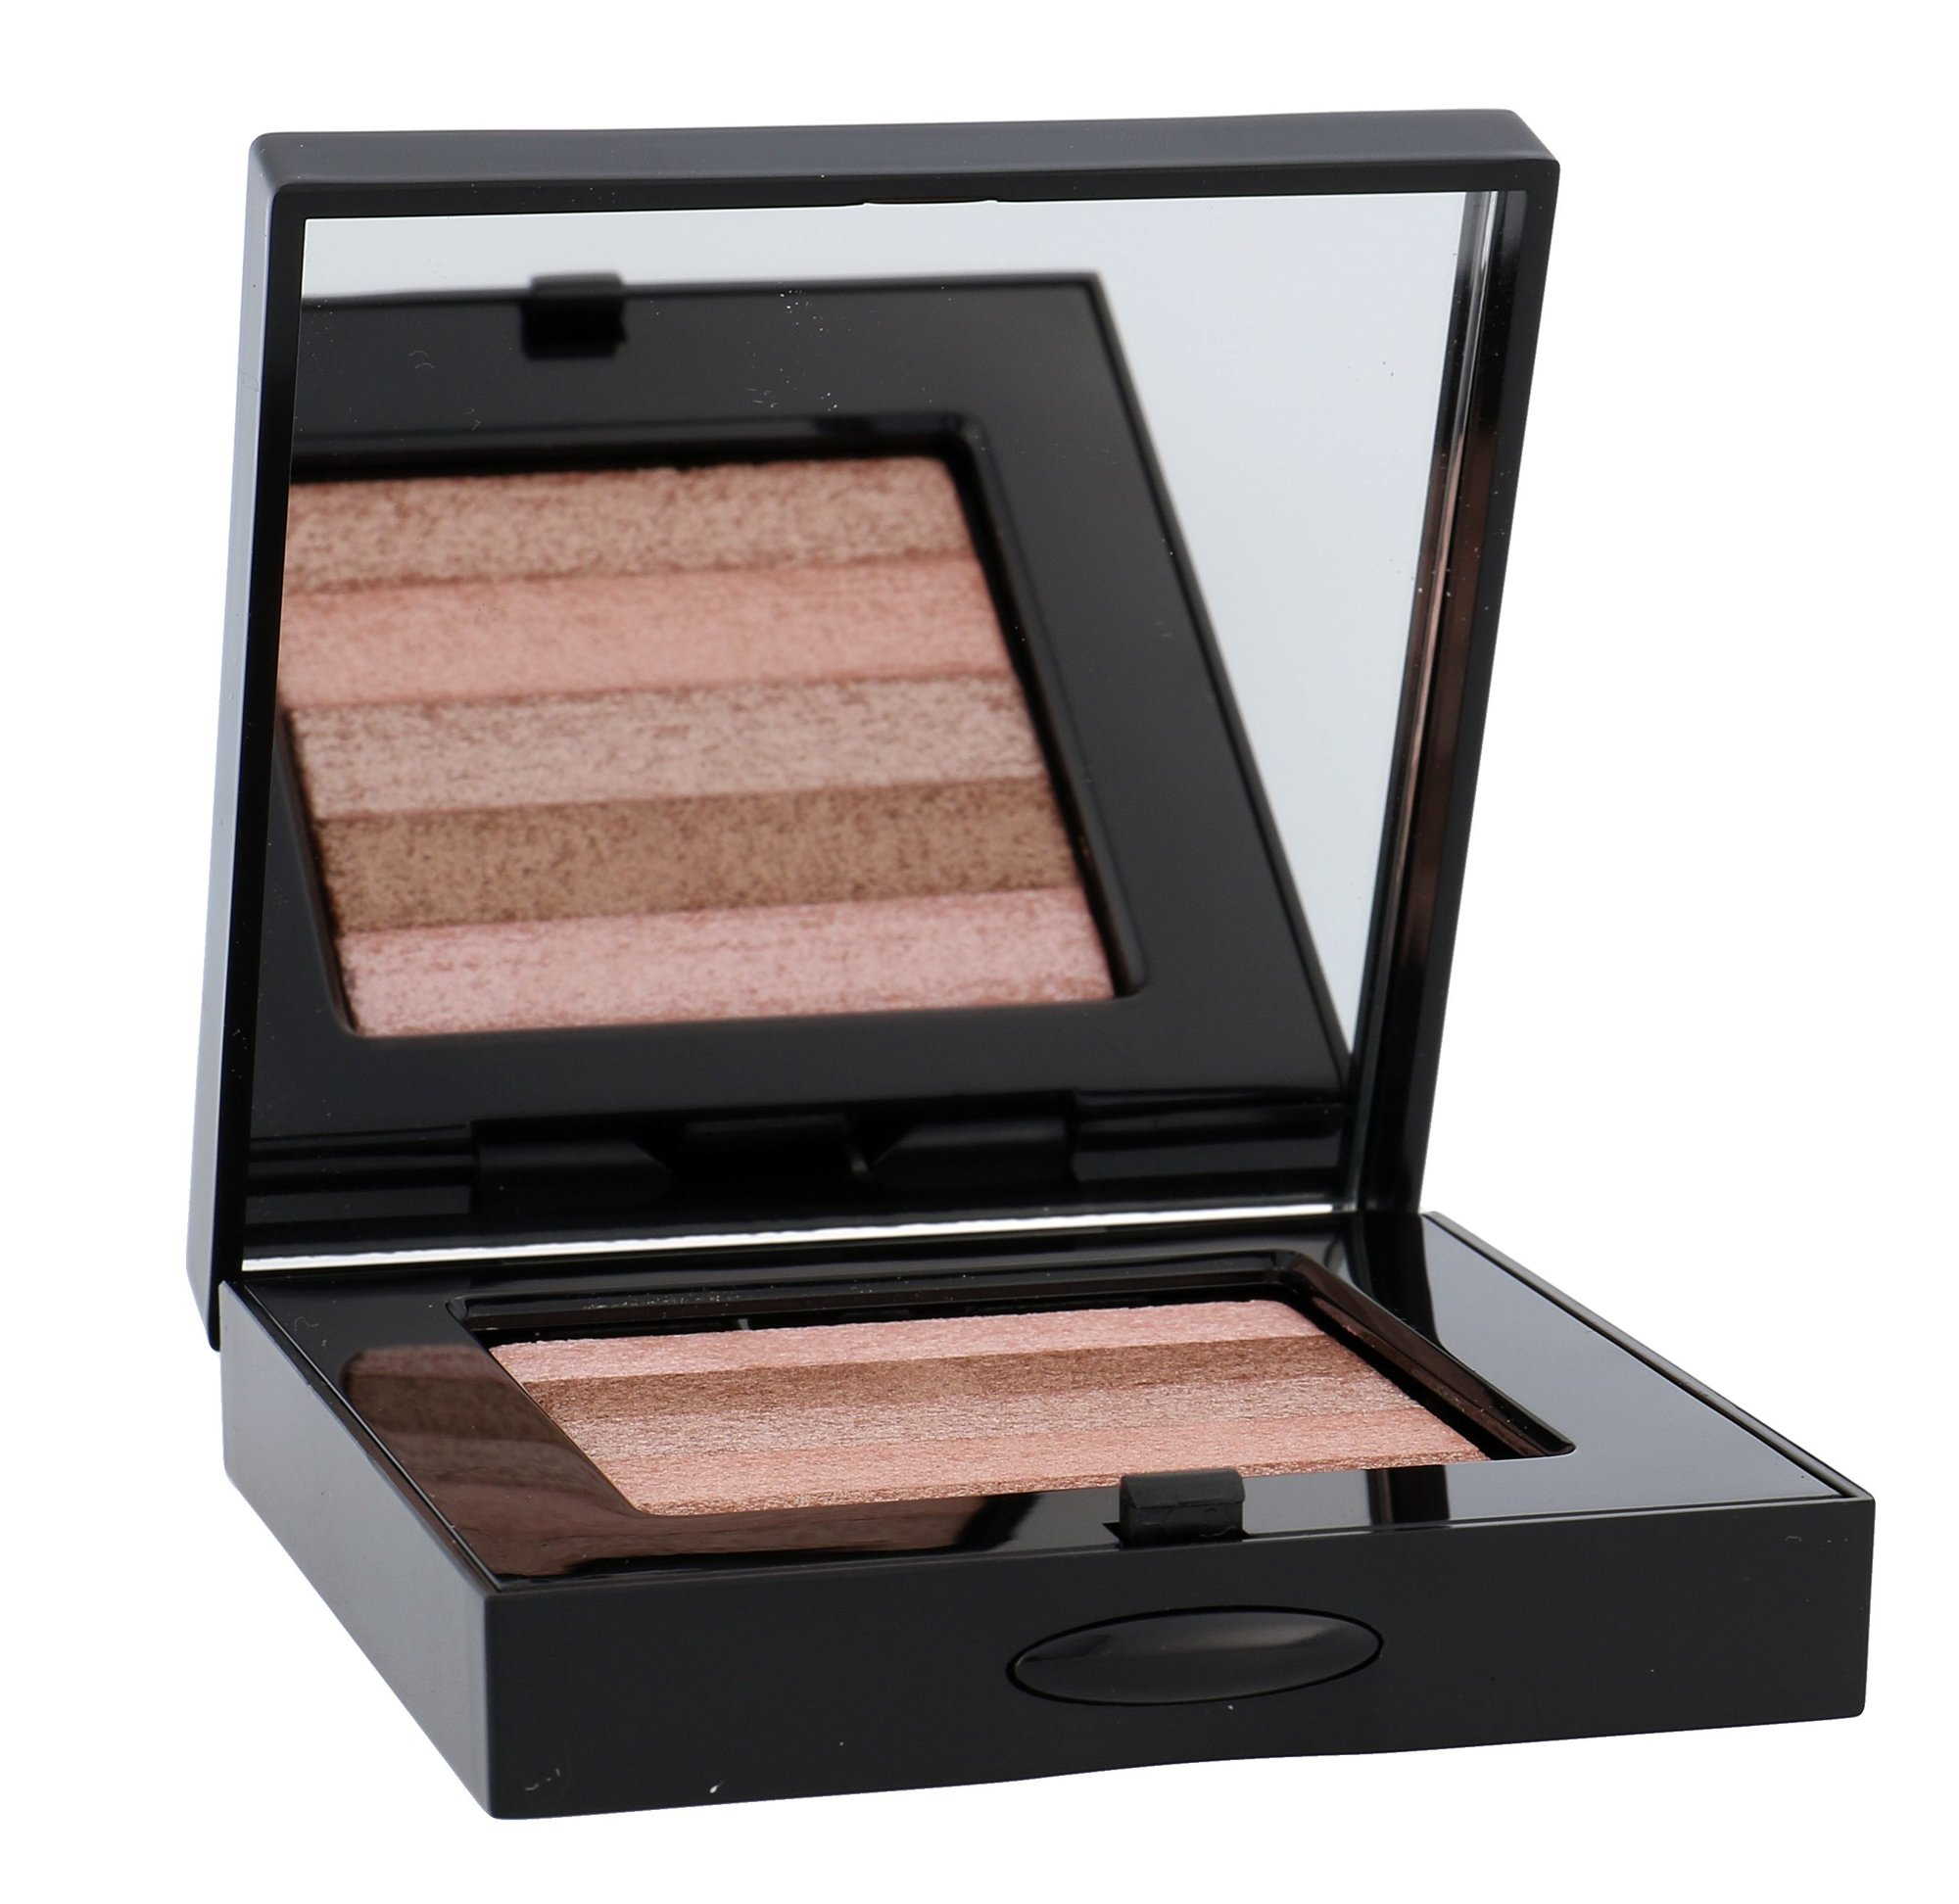 Bobbi Brown Shimmer Brick Compact Cosmetic 10,3ml Pink Quartz